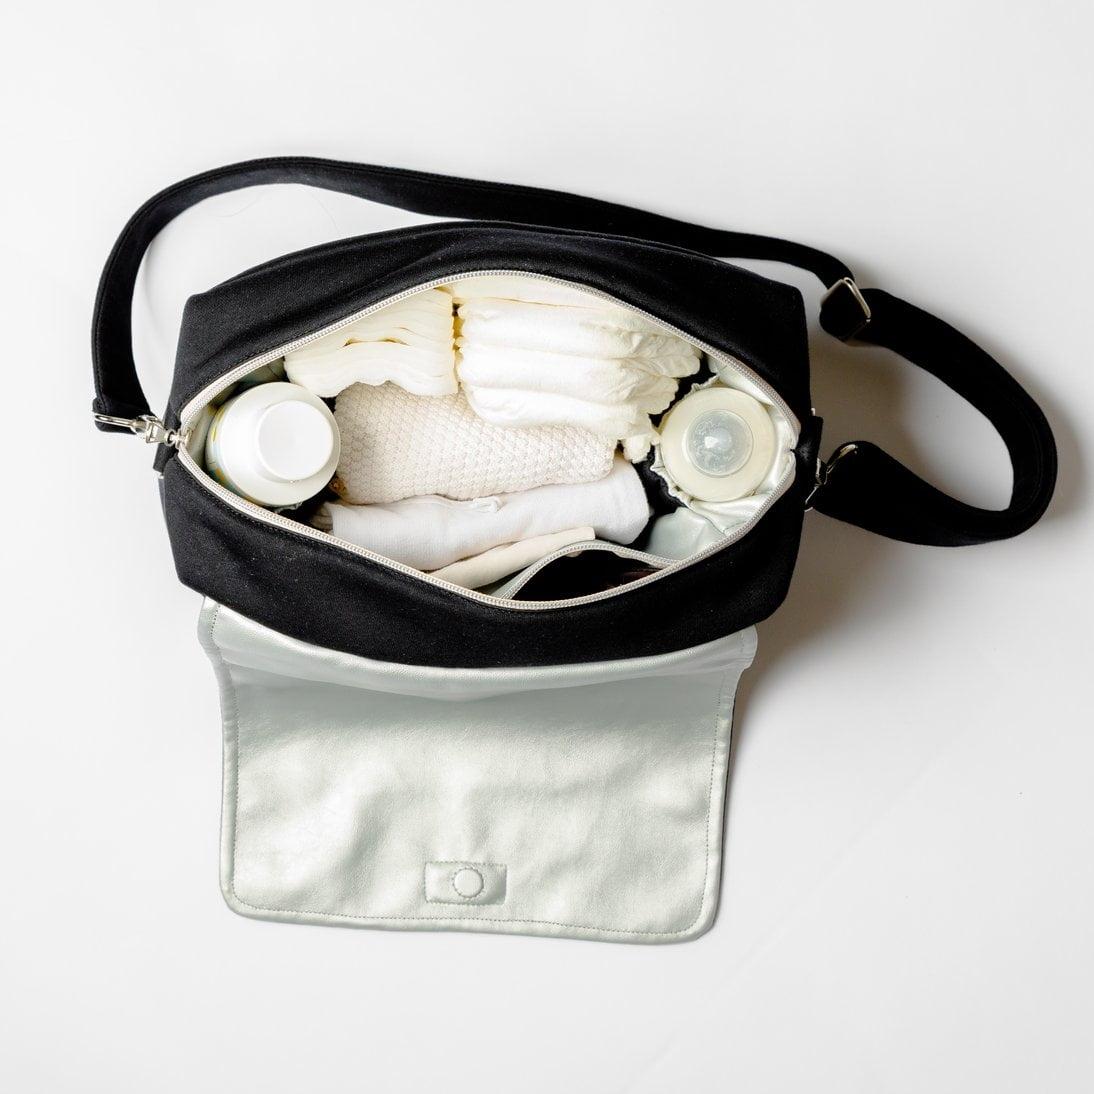 Previjalna torba MINI JERSEY Black-1975